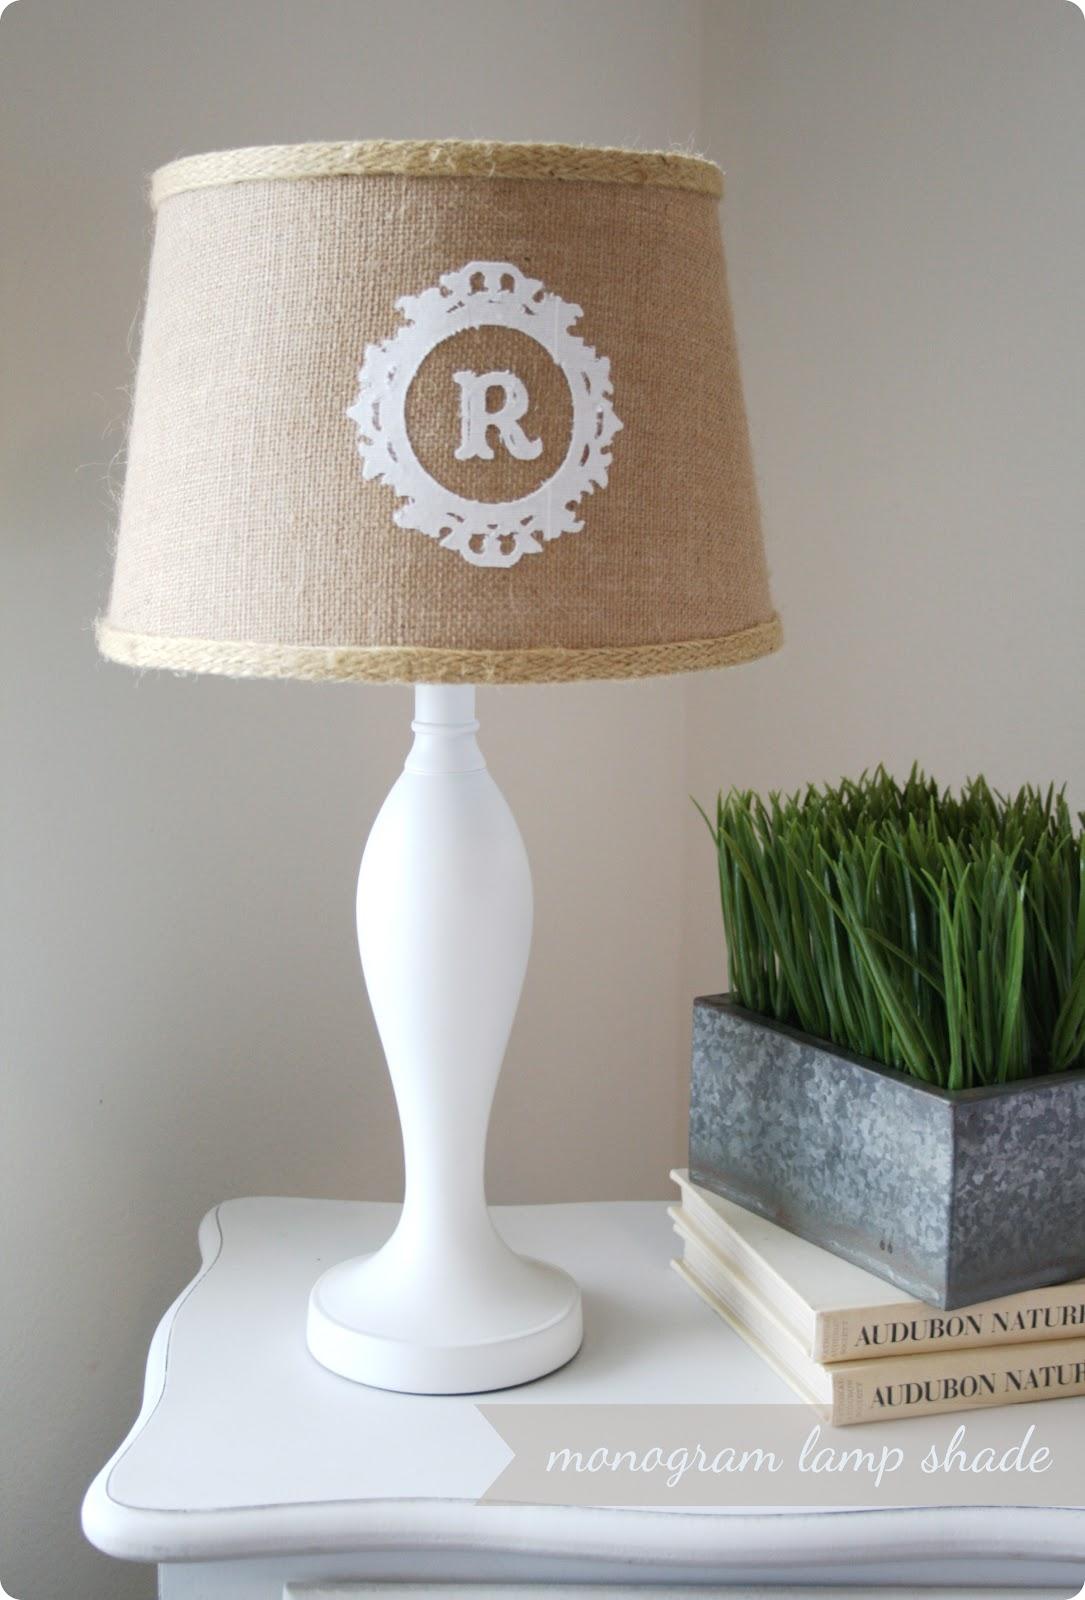 http://3.bp.blogspot.com/-okkumG45cx8/T2ZHOeHKSWI/AAAAAAAAAlg/bBKs6UbeF1k/s1600/monogram_lamp.jpg